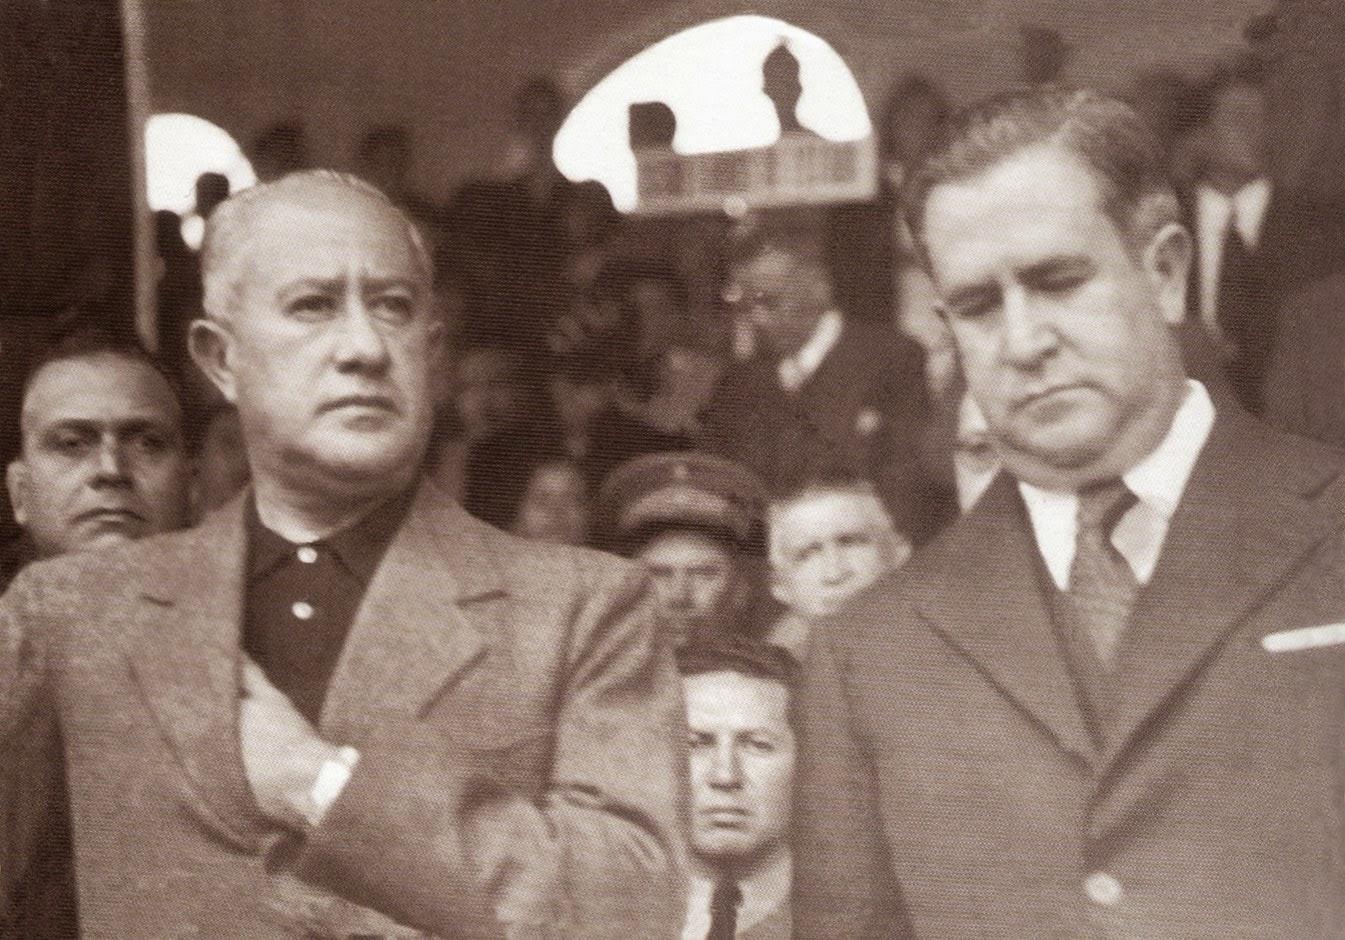 gustavo-diaz-ordaz-presidente-octubre-68-maximino-avila-camacho